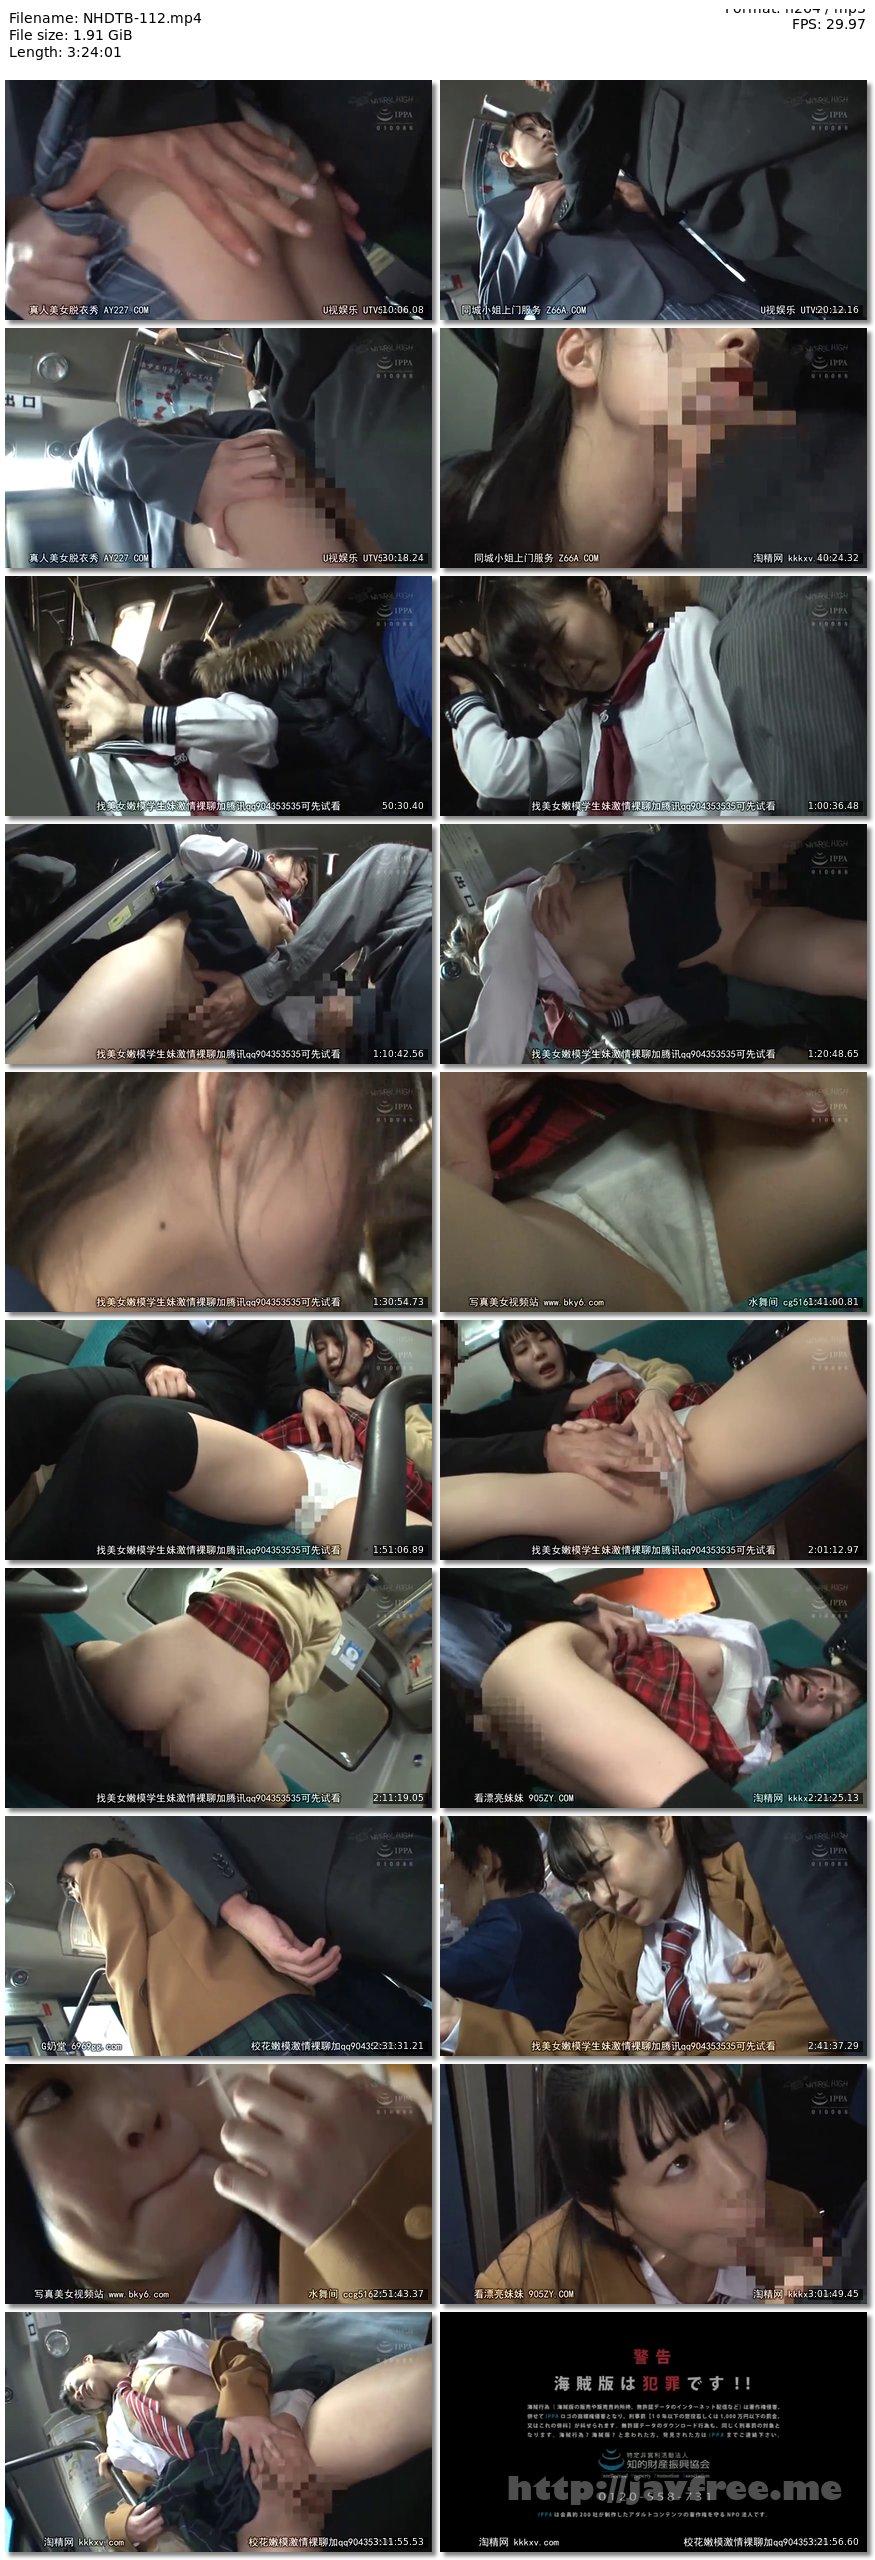 [HD][KAR-953] またもや衝撃流出!会社訪問にやってきたリクスー就活女子を昏睡レイプした人事担当者の記録動画 - image NHDTB-112 on http://javcc.com